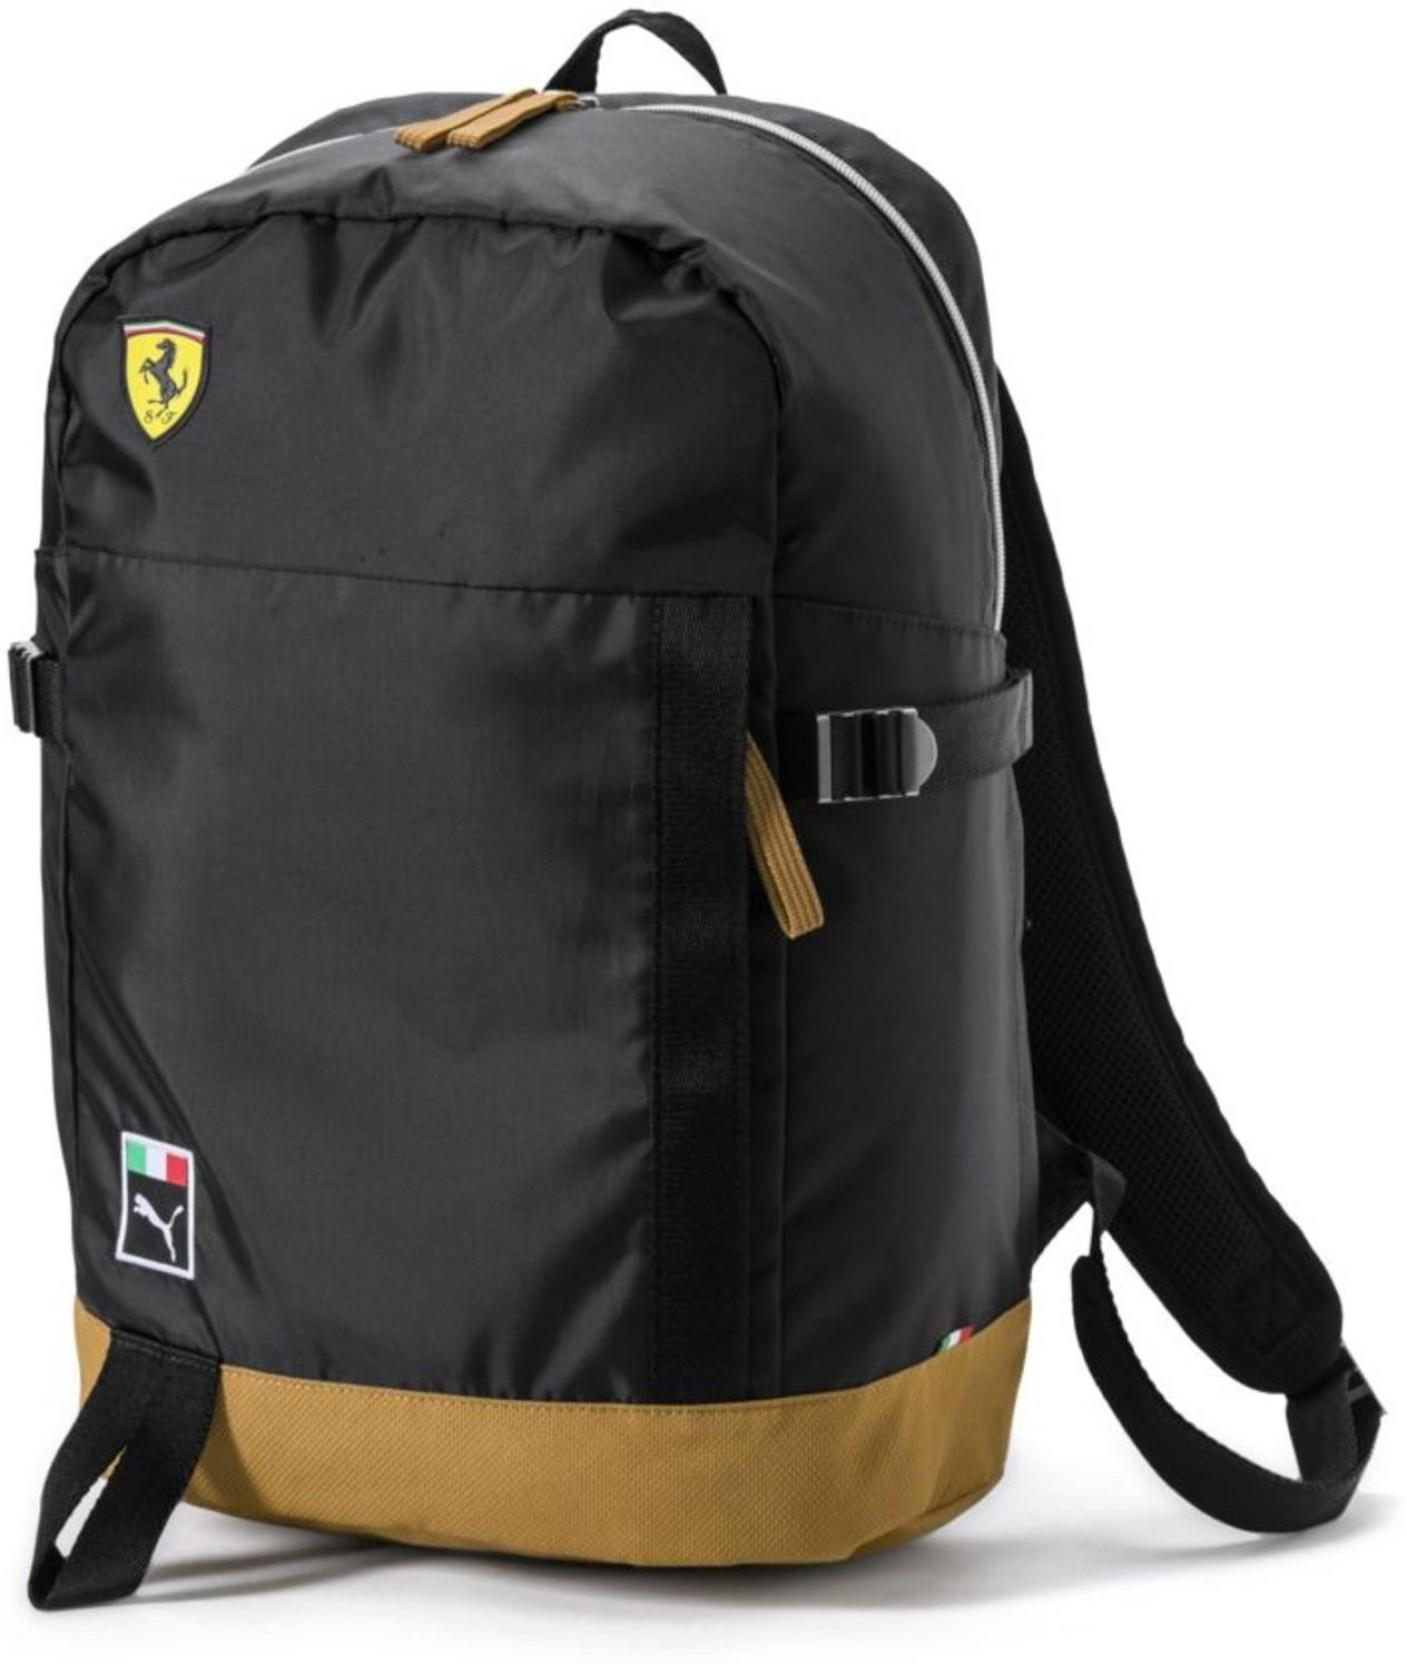 f748a9db0d Puma SF Fanwear 23 L Laptop Backpack Black - Price in India ...